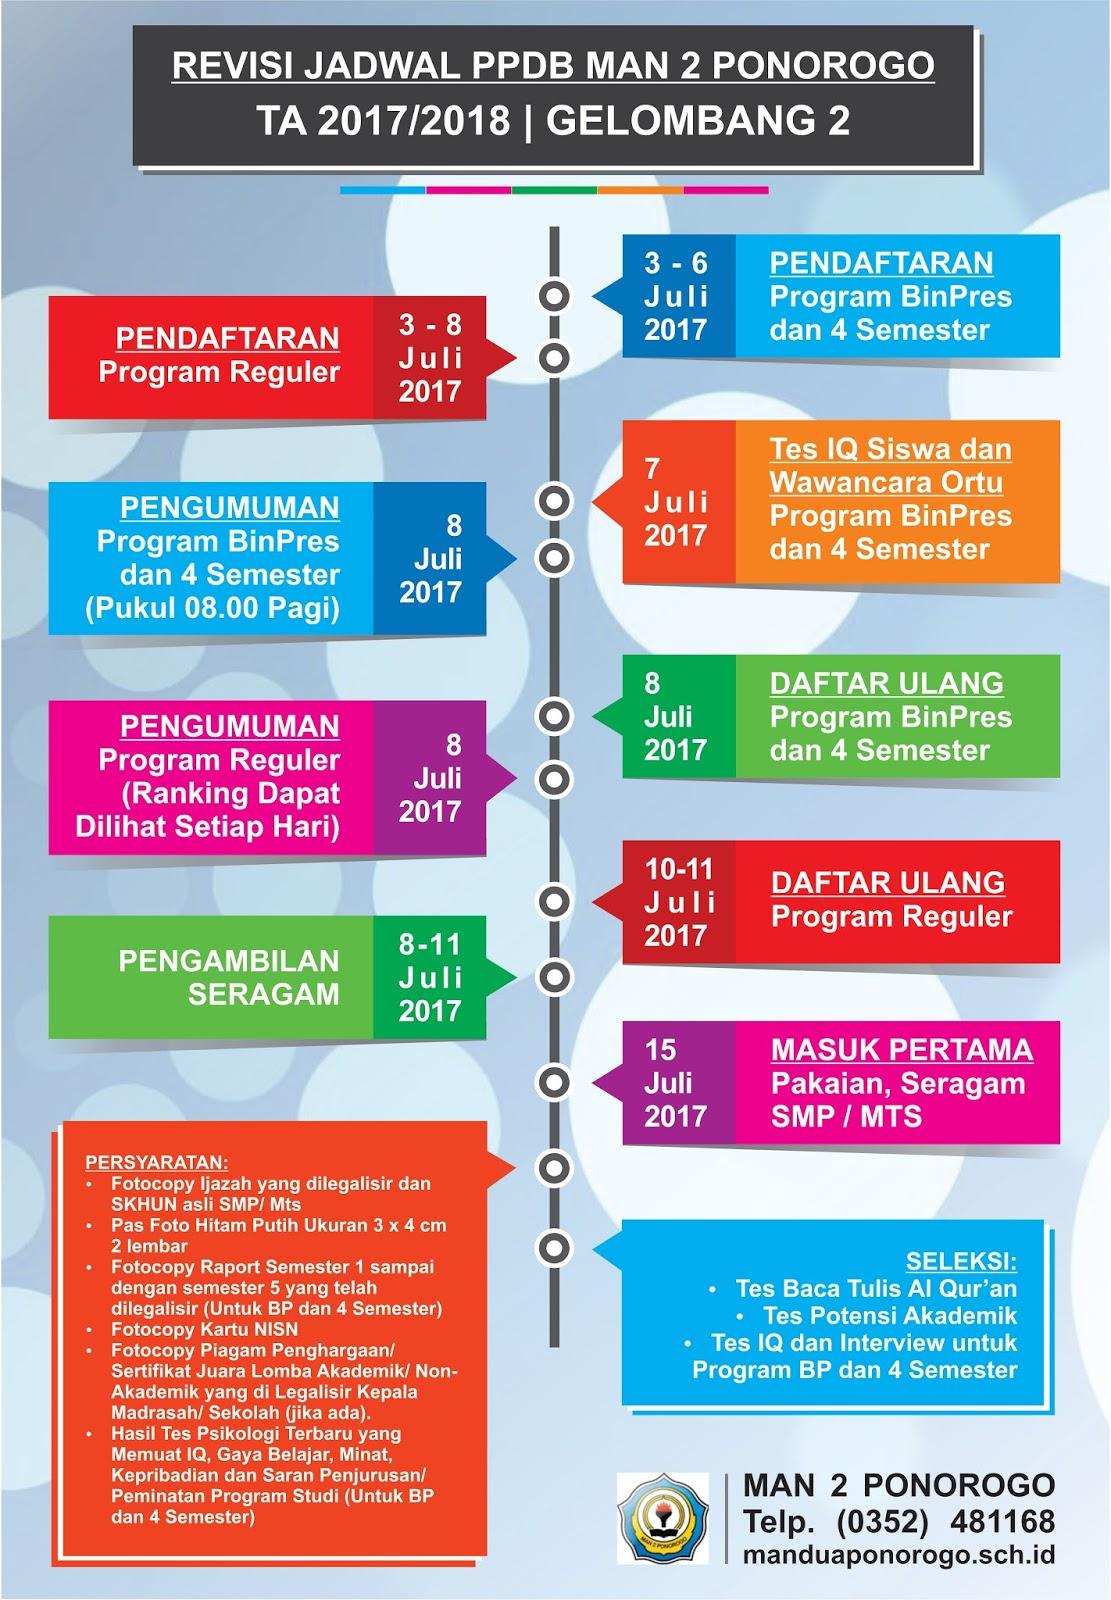 Jadwal PPDB MAN 2 Ponorogo Tahun Ajaran 2017/2018 Gelombang 2